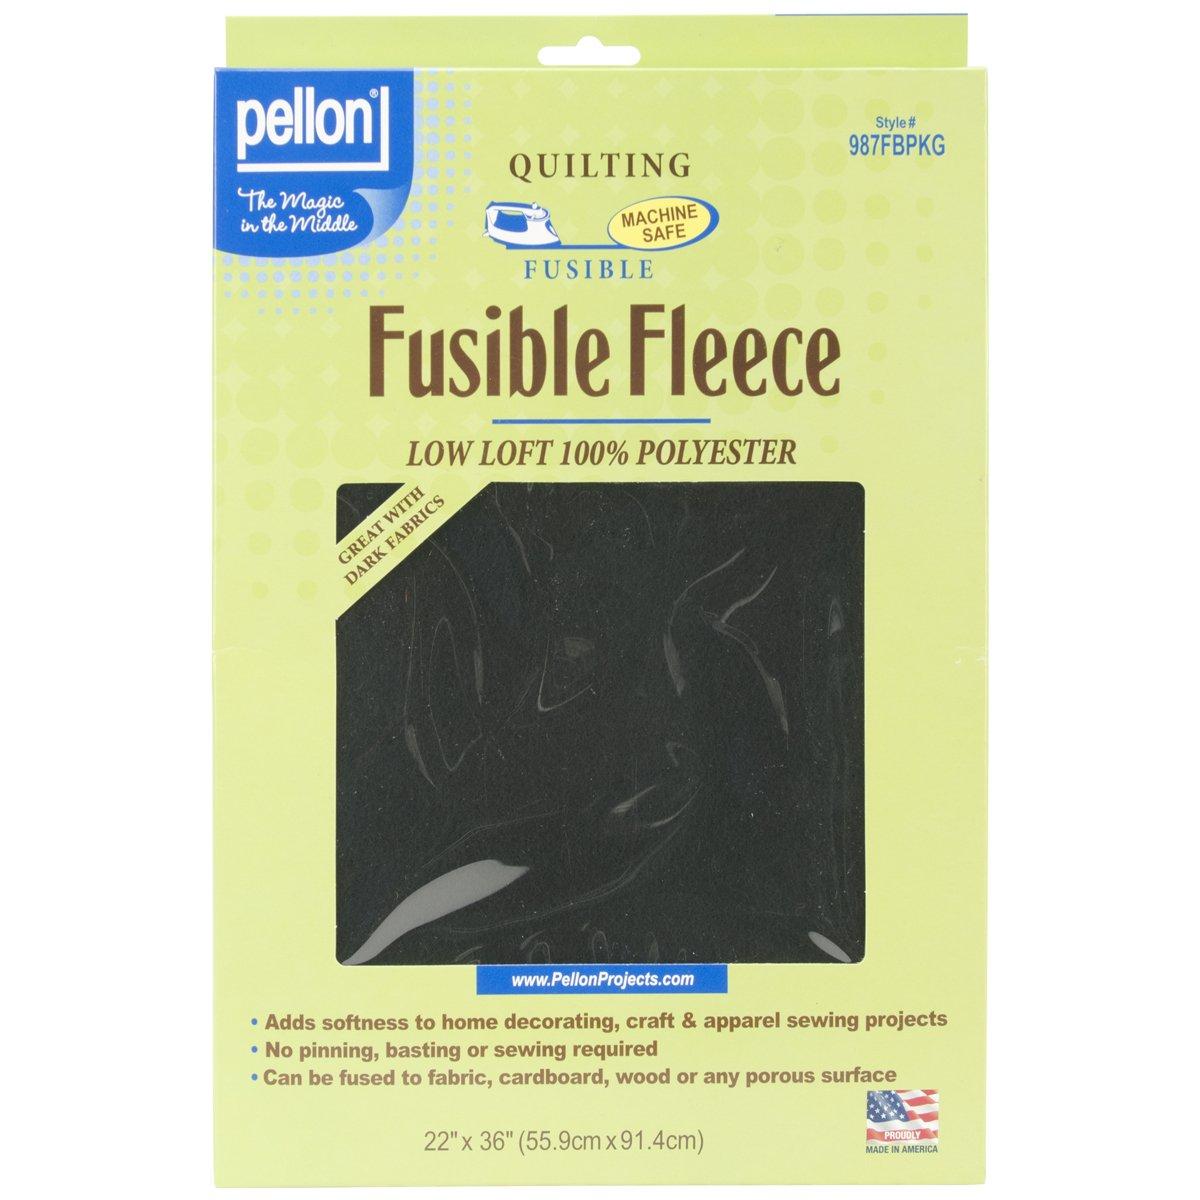 Pellon Fusible Fleece, 22-Inch x 36-Inch, Black 987FBPKG